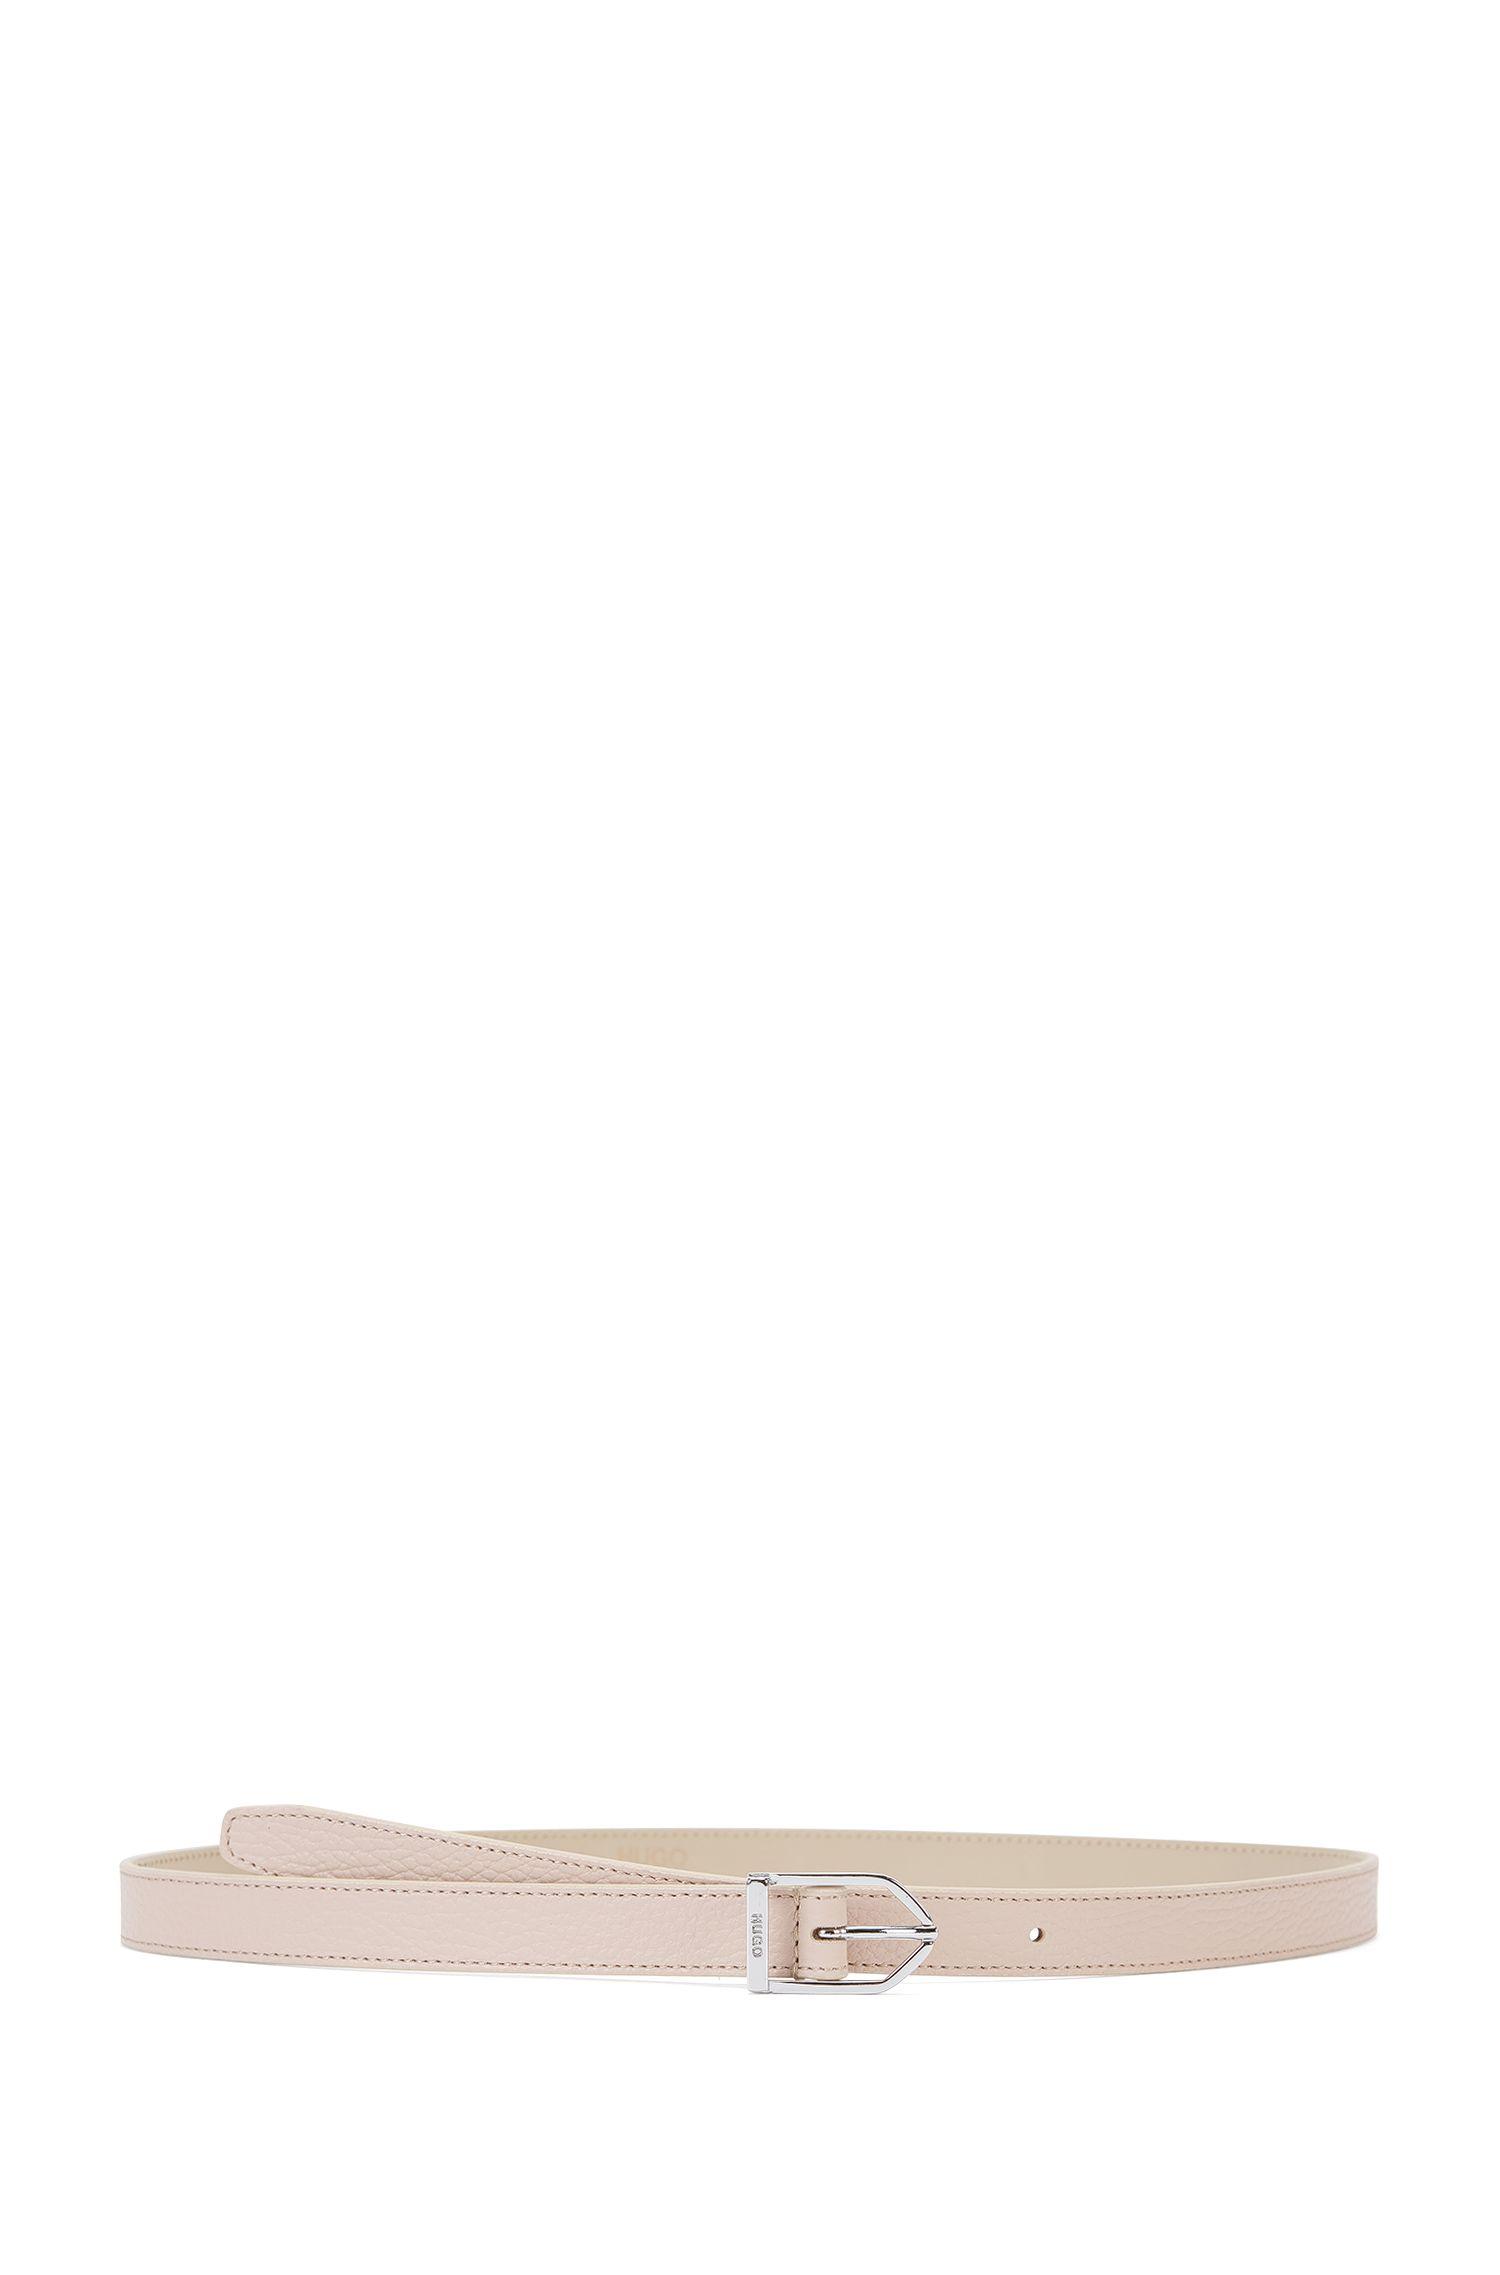 Cintura femminile in pelle italiana di qualità superiore